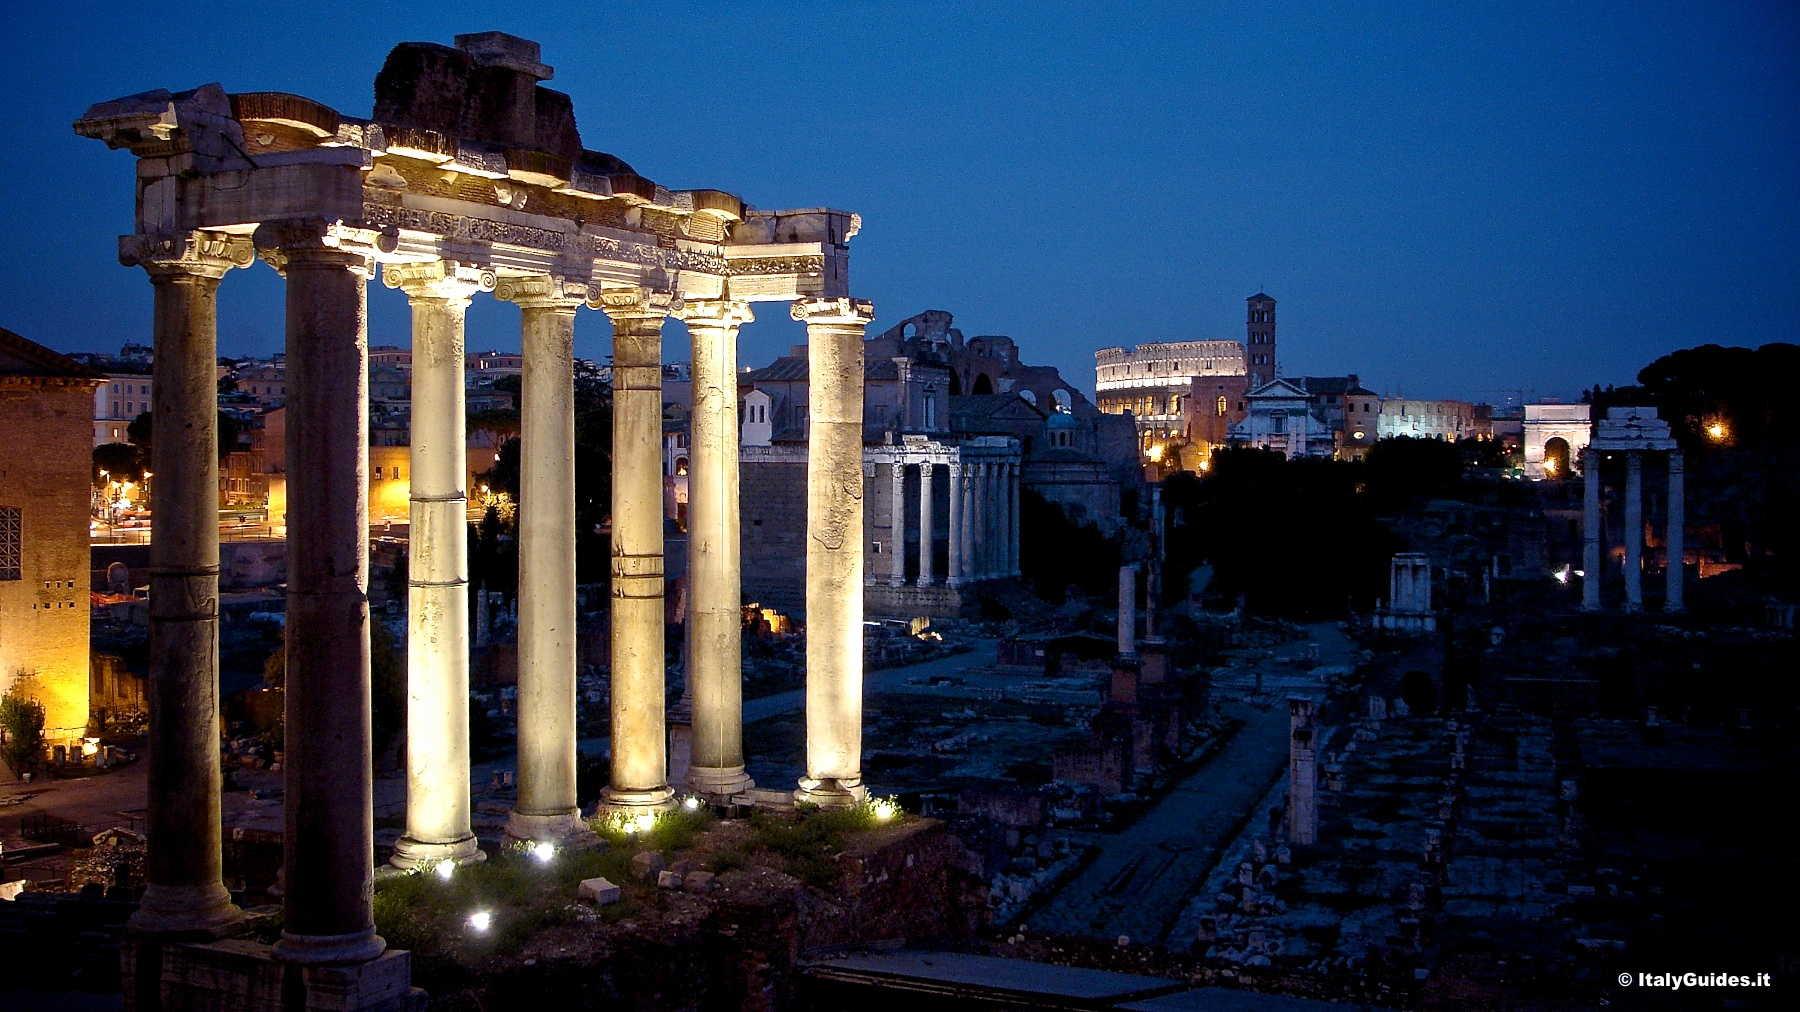 Hotel Forum Rome Italy